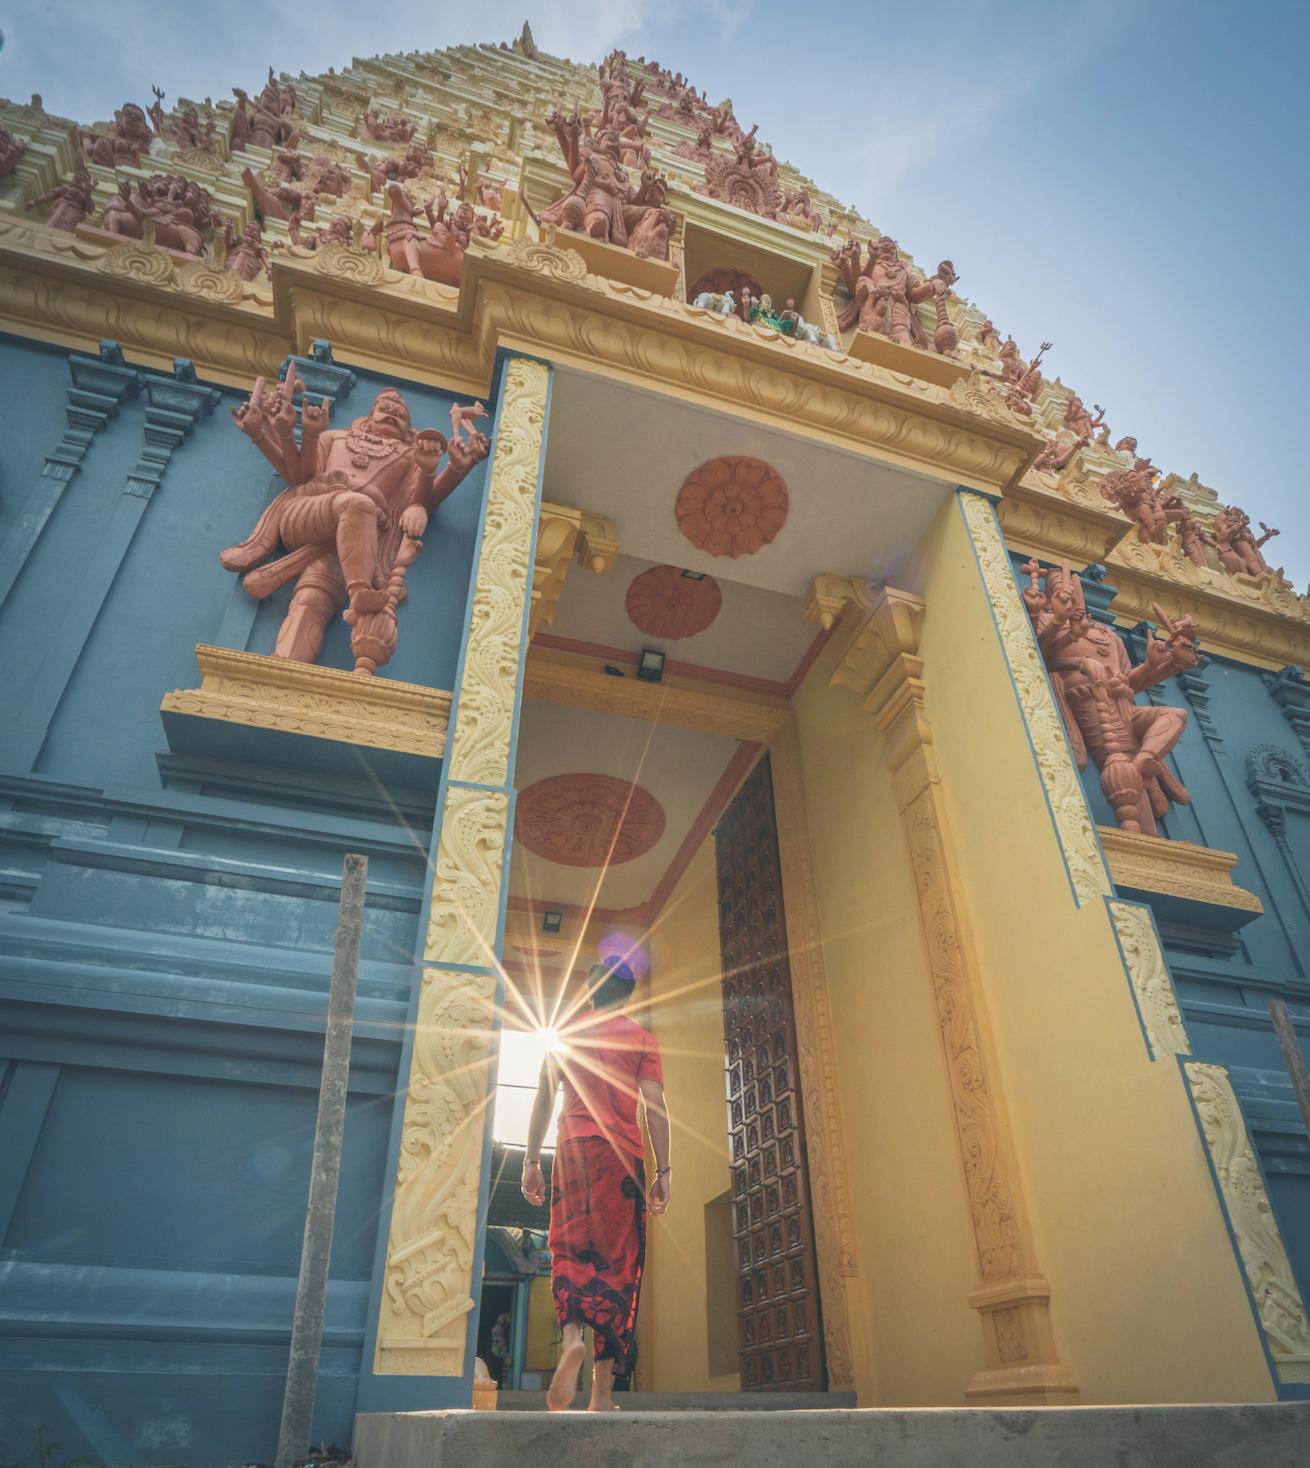 Naguleswaram Temple (Keerimalai Naguleswaram Kovil) in Kankesanturai, Sri Lanka